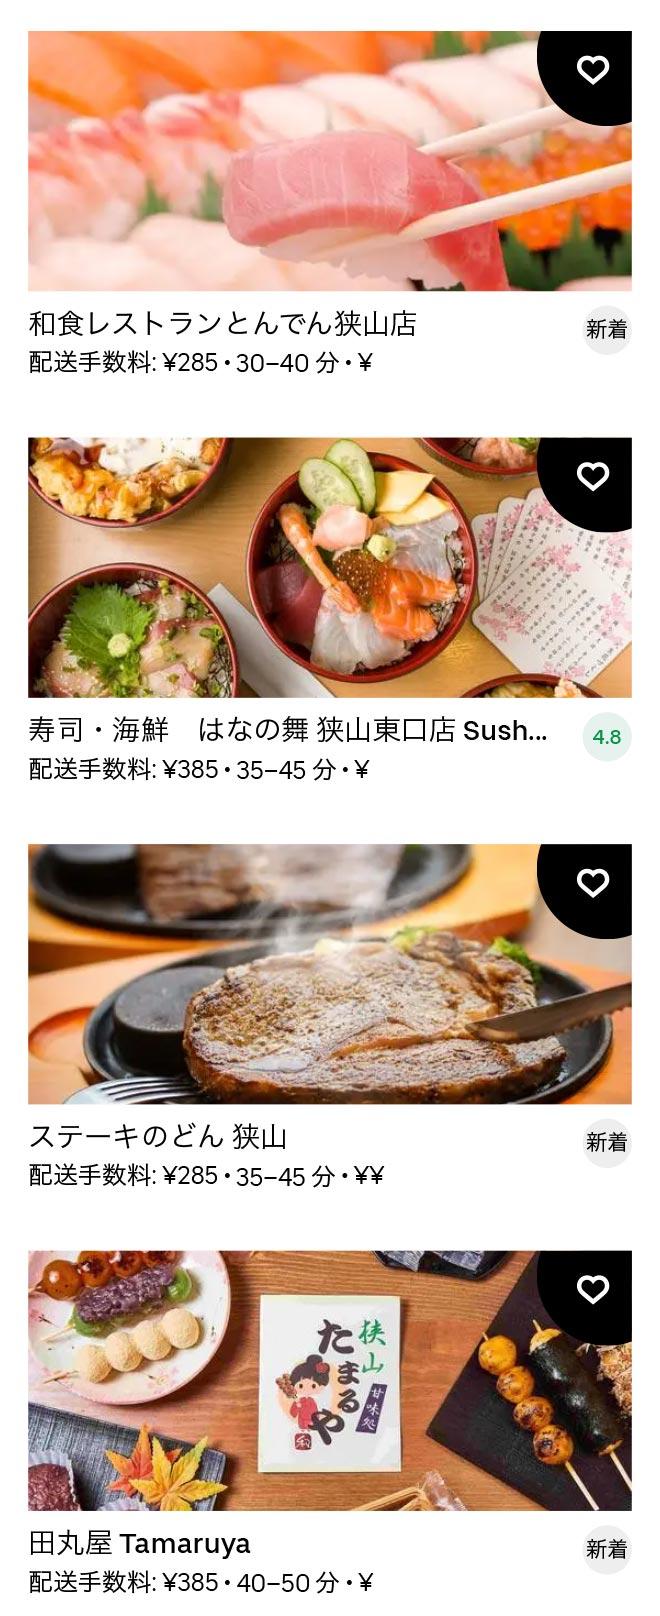 Iruma menu 2101 11